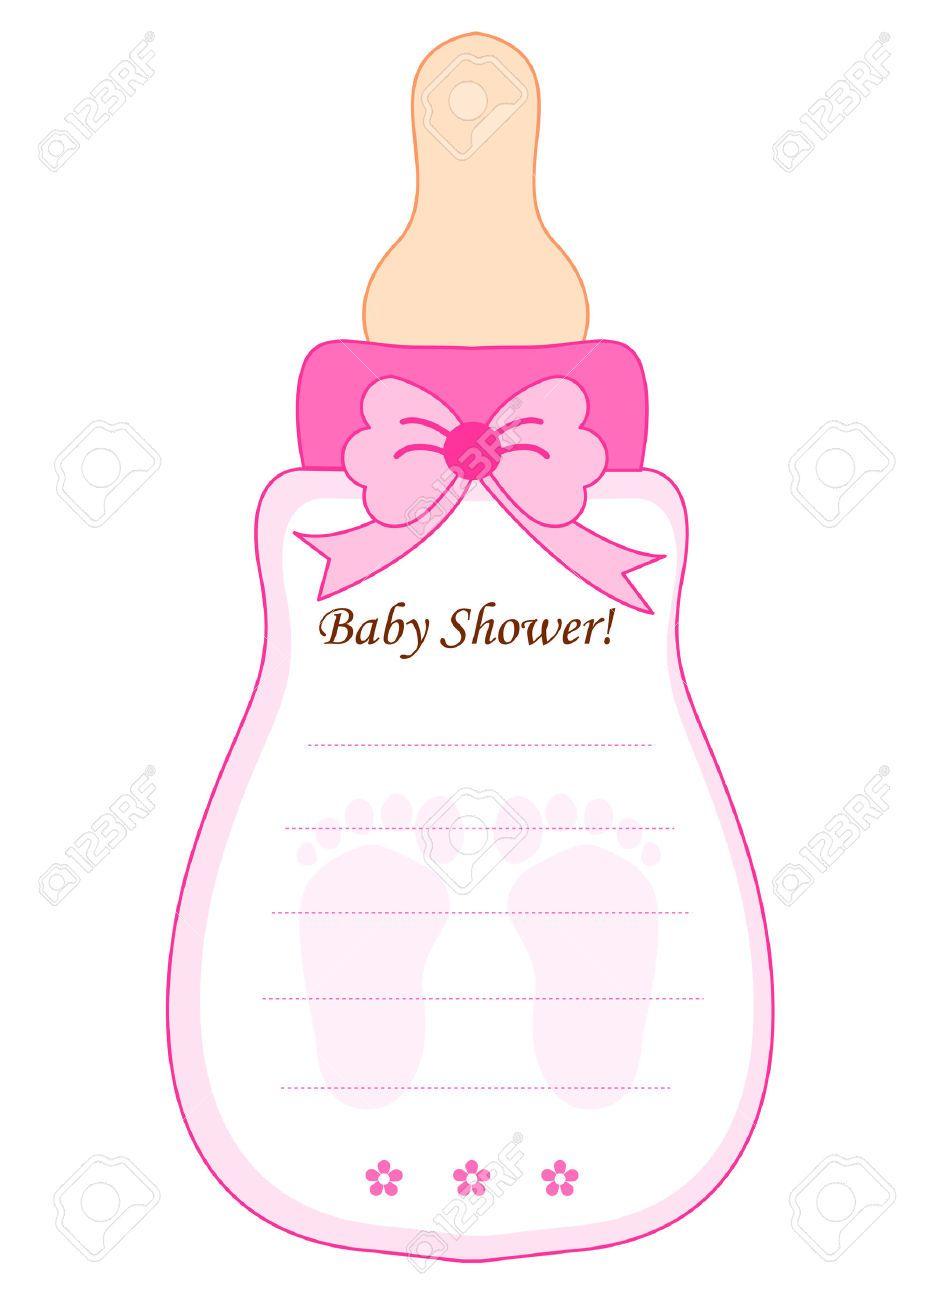 Cute Feeding Bottle Shaped Baby Shower Invitation Card